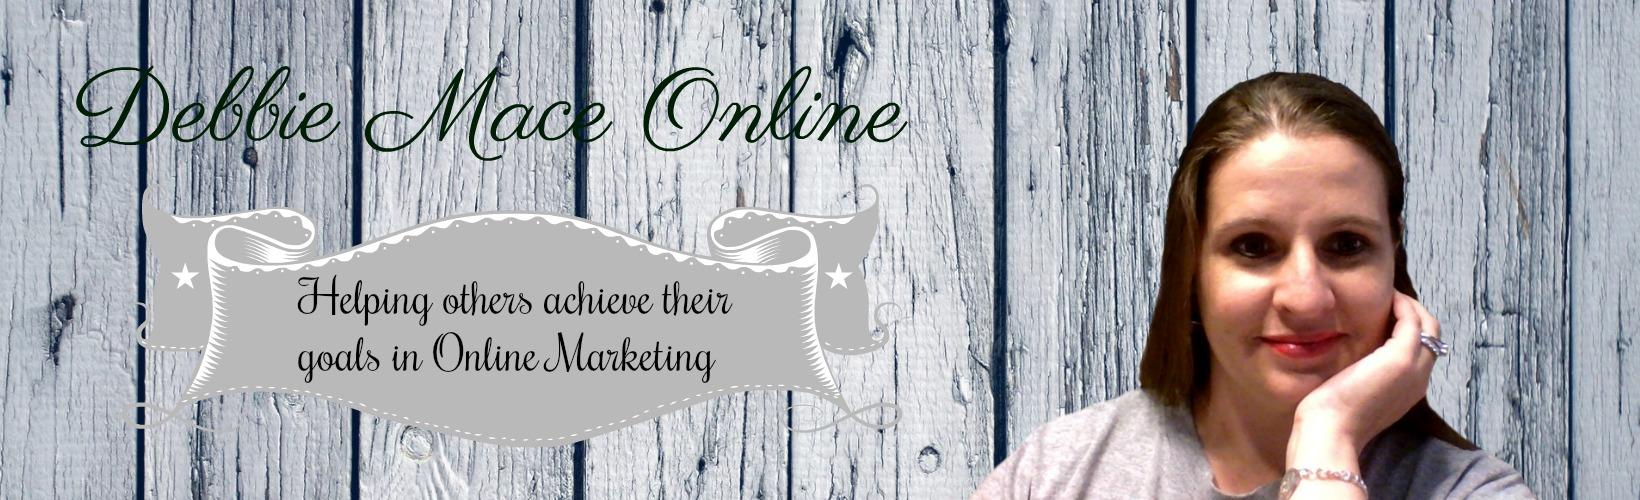 Debbie Mace Online